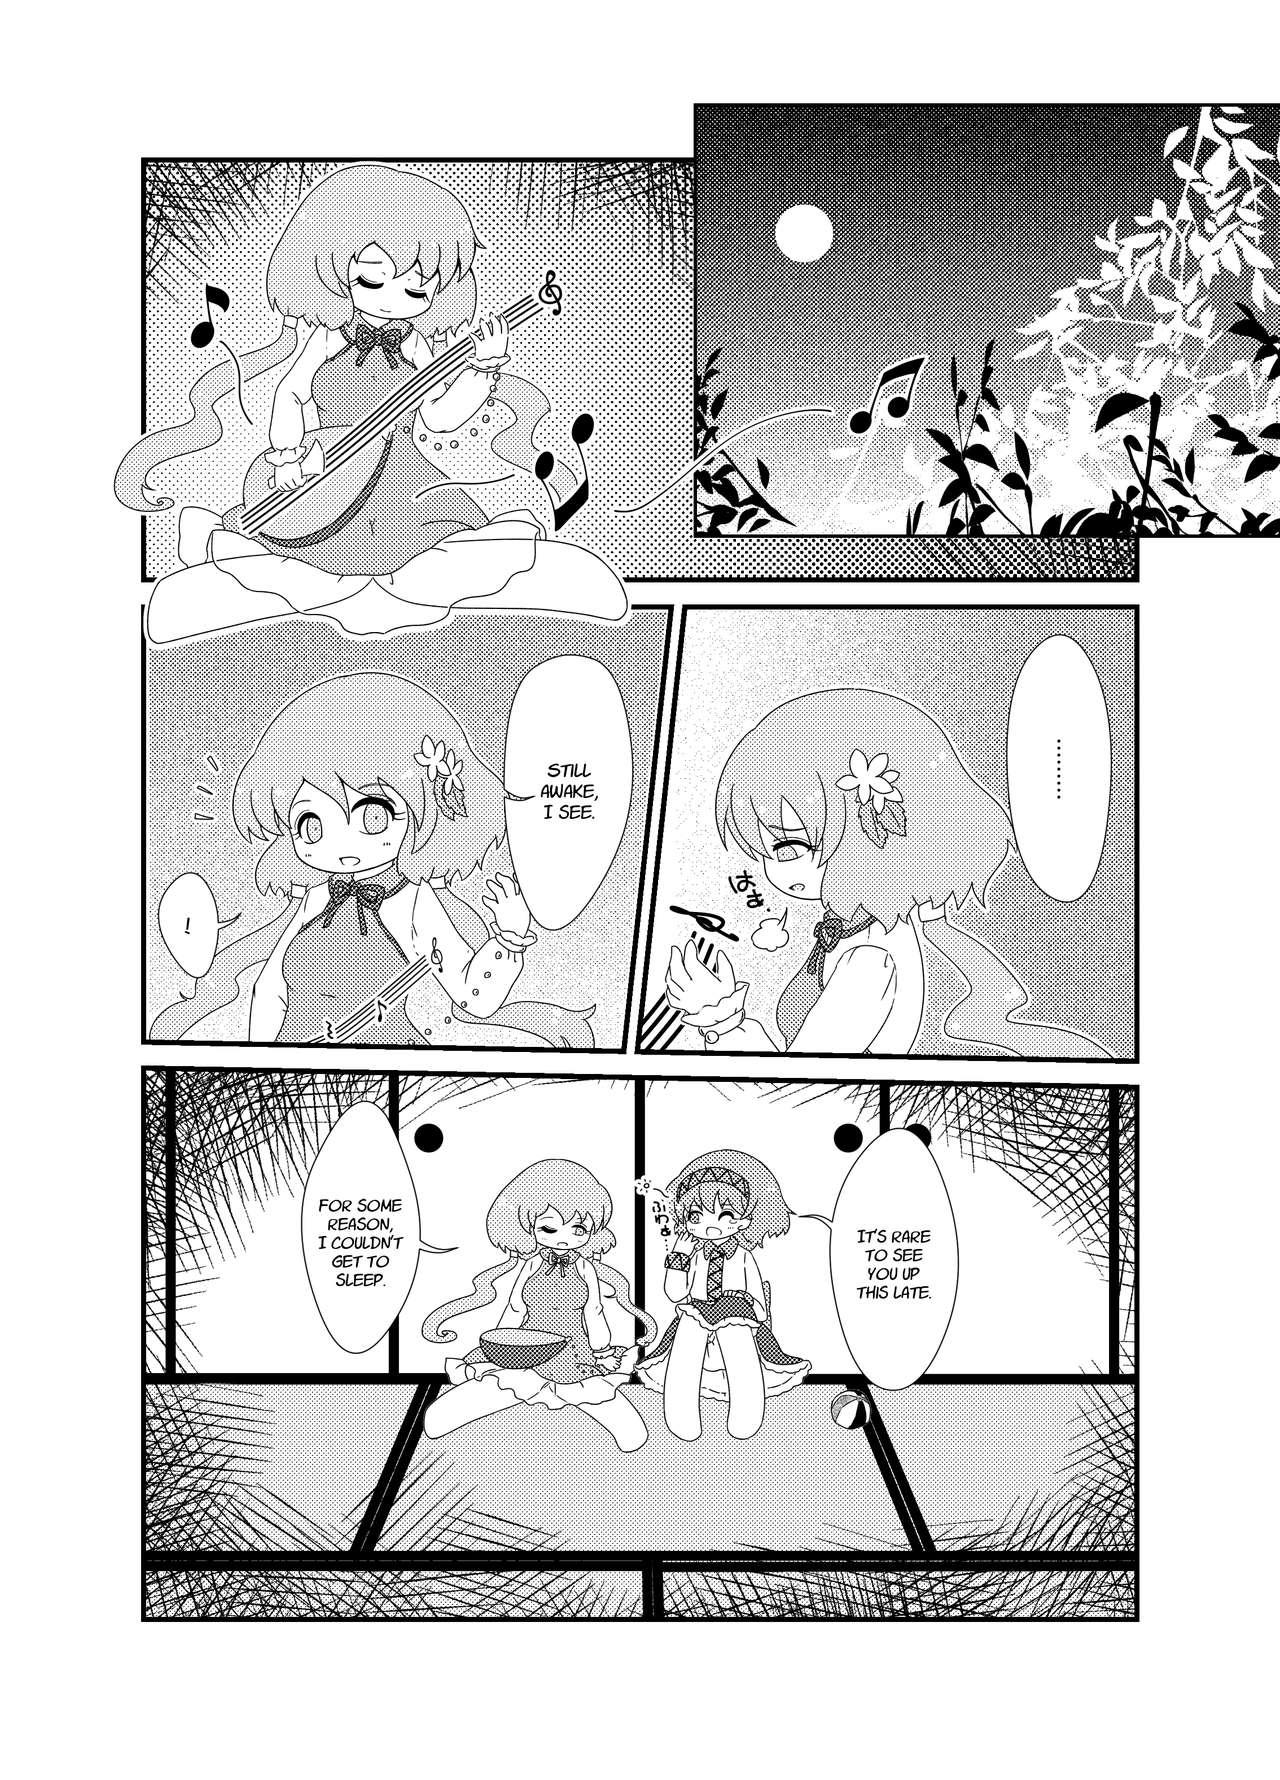 Kimi Houkou e   Toward You 1